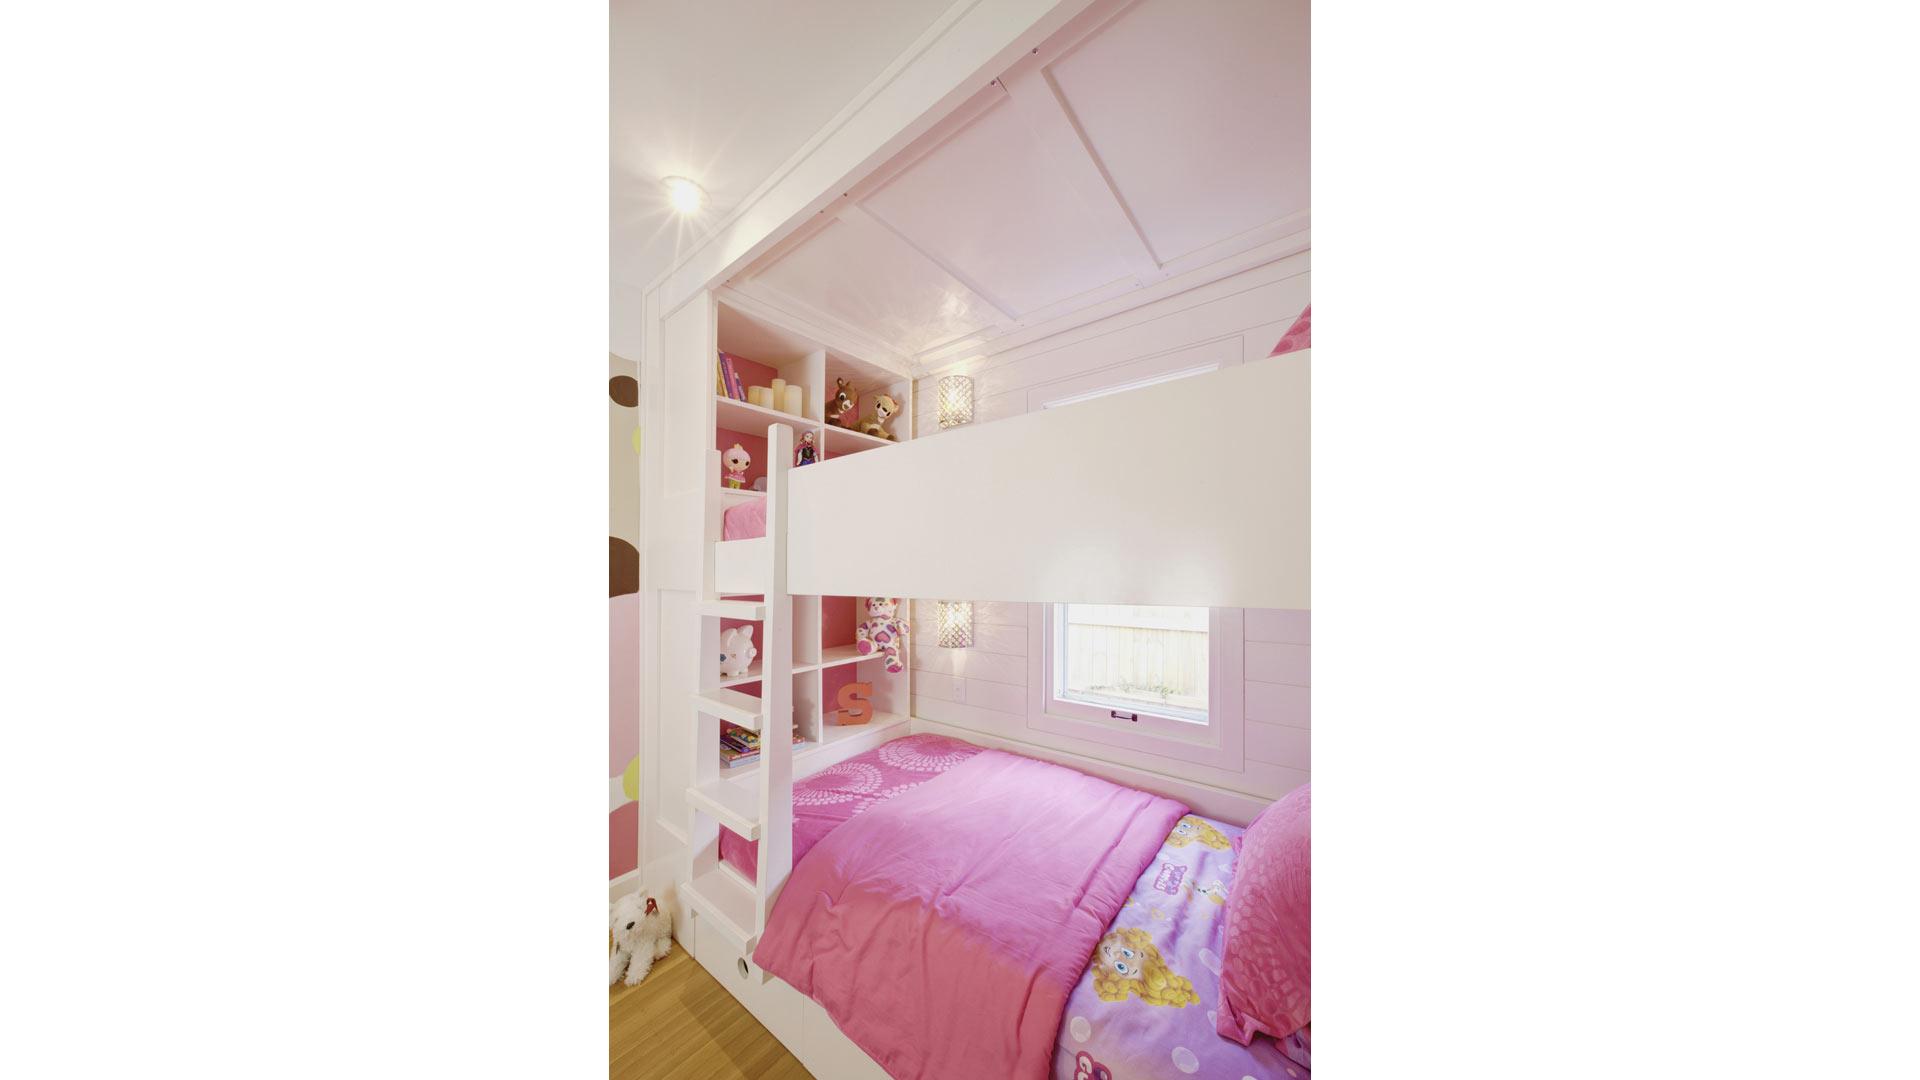 Classic Irvington Tudor Remodel - Custom Bunk Beds - HAUS Architecture, WERK Building Modern, Christopher Short, Indianapolis Architect